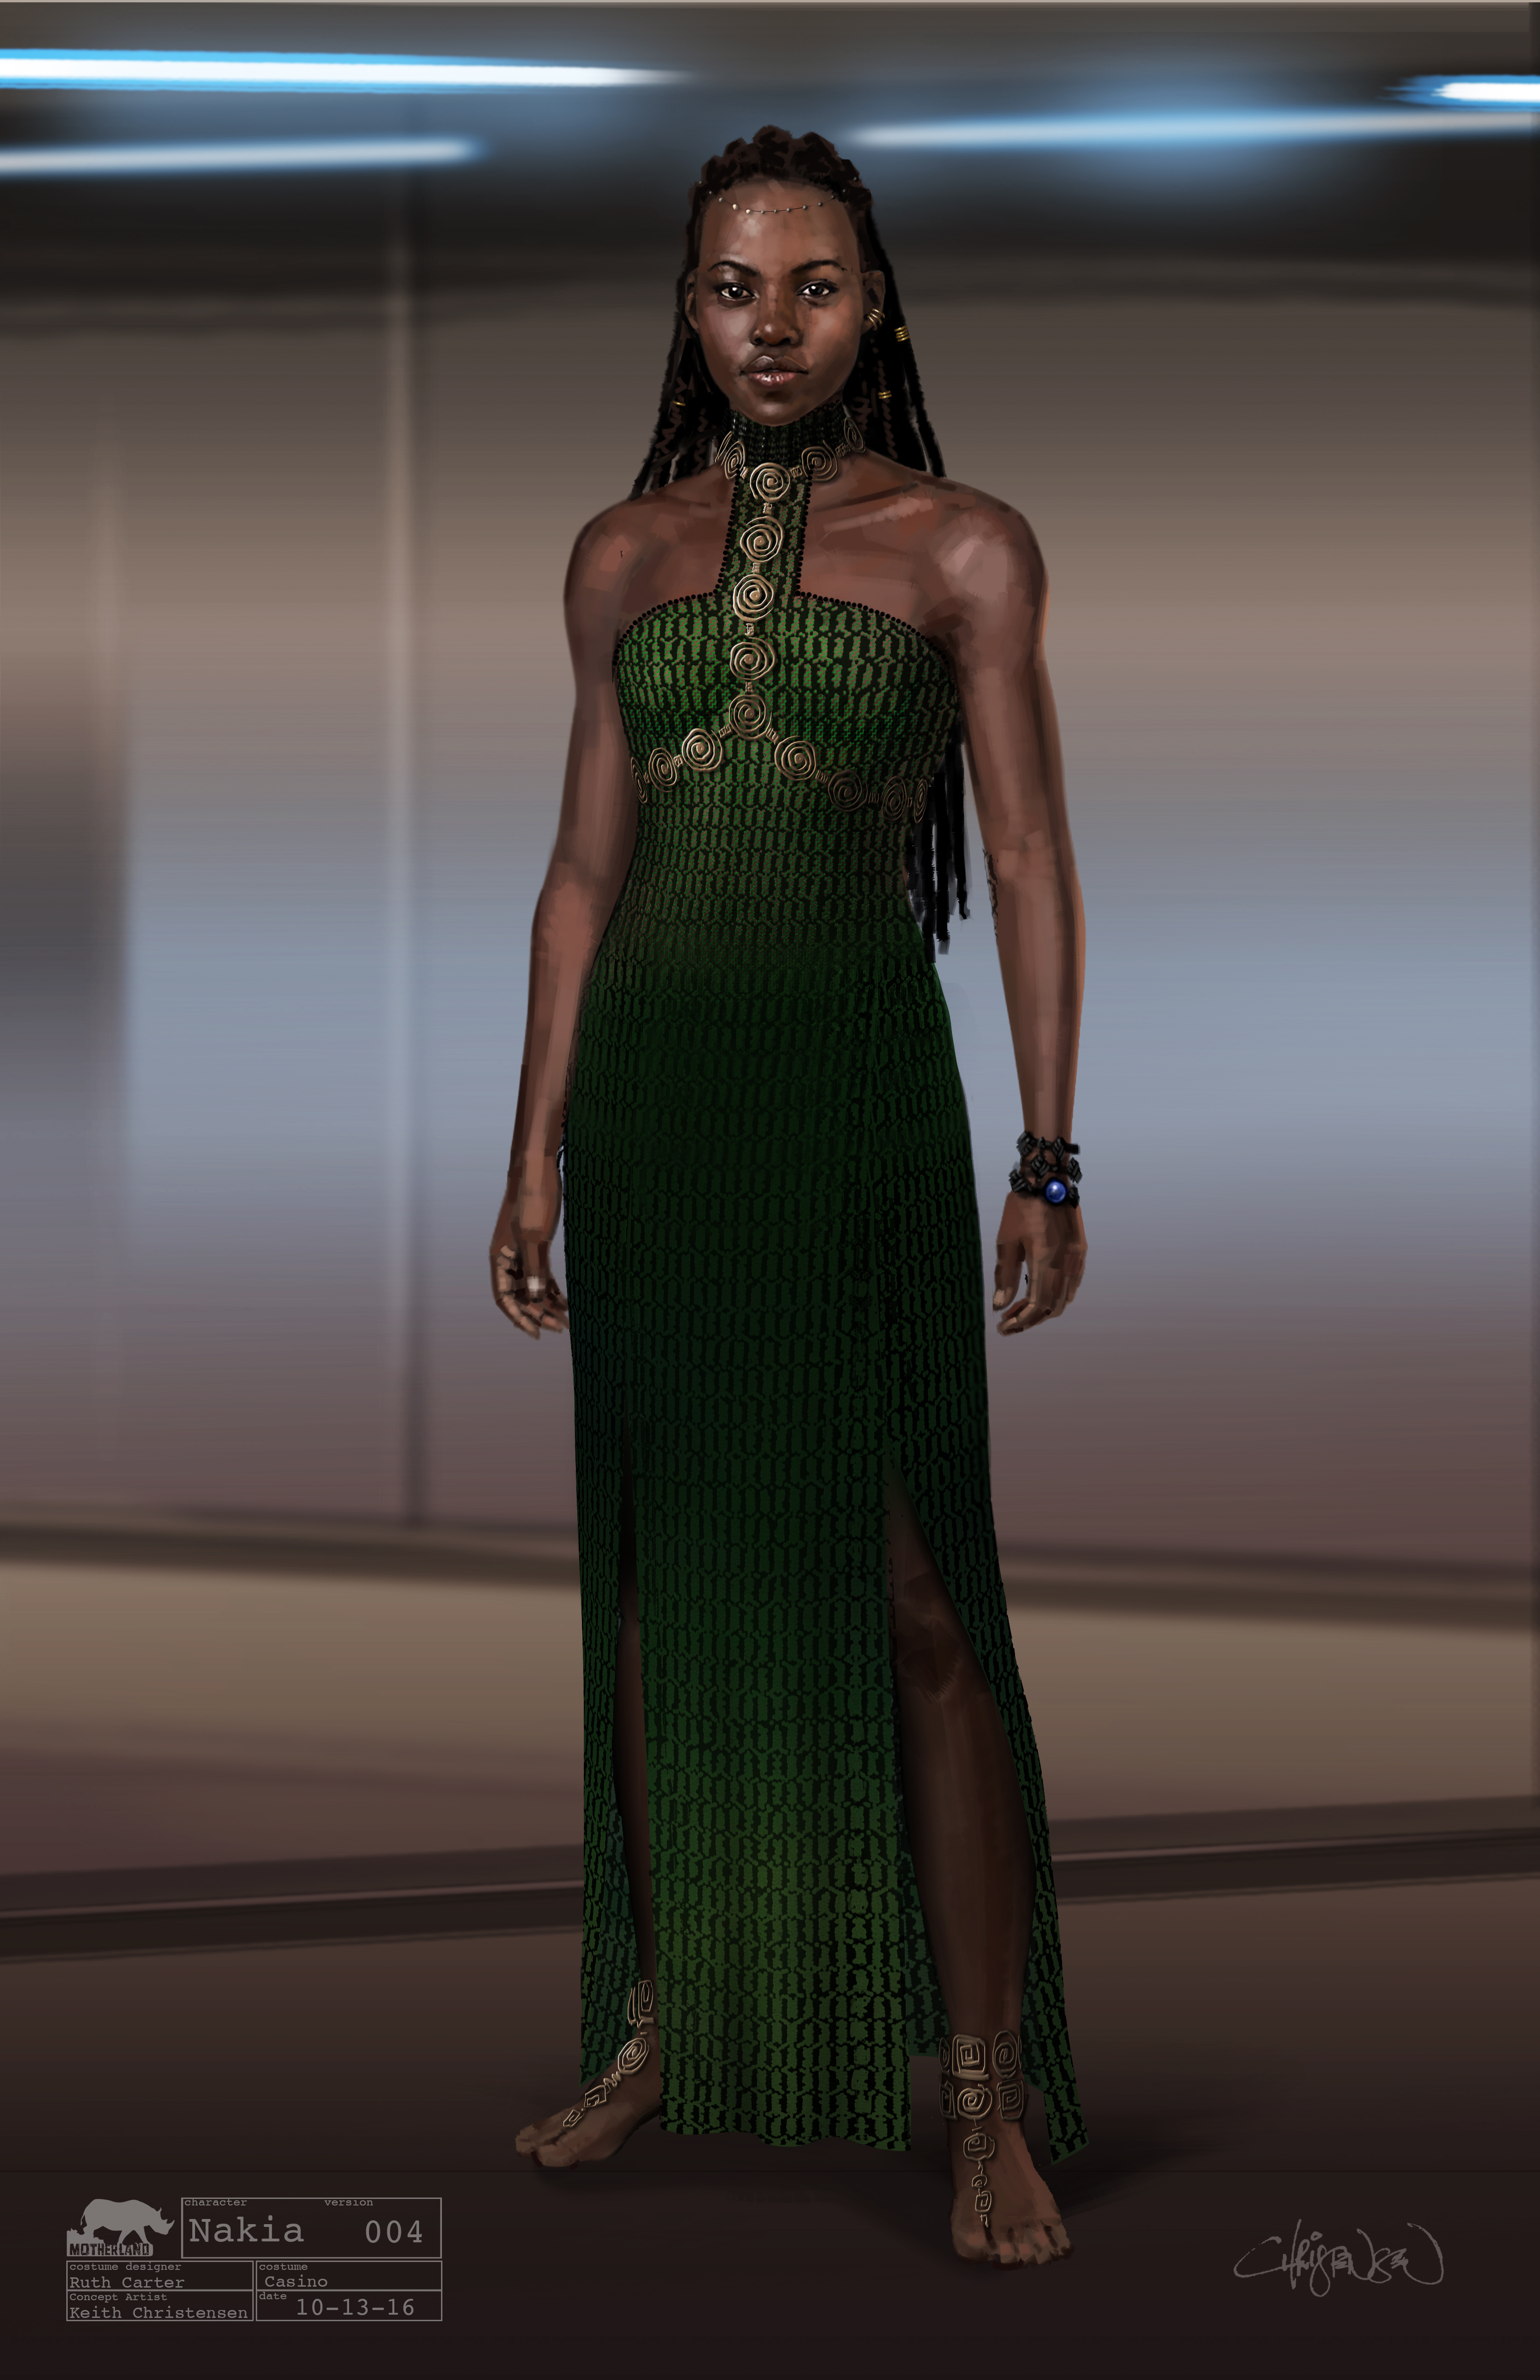 Marvel Studios' BLACK PANTHER                                                              Nakia Conceptual Character and Costume Design Sketch                                                              Costume Design: Ruth Carter                               Concept Artist: Keith Christensen                                                               ©Marvel Studios 2018